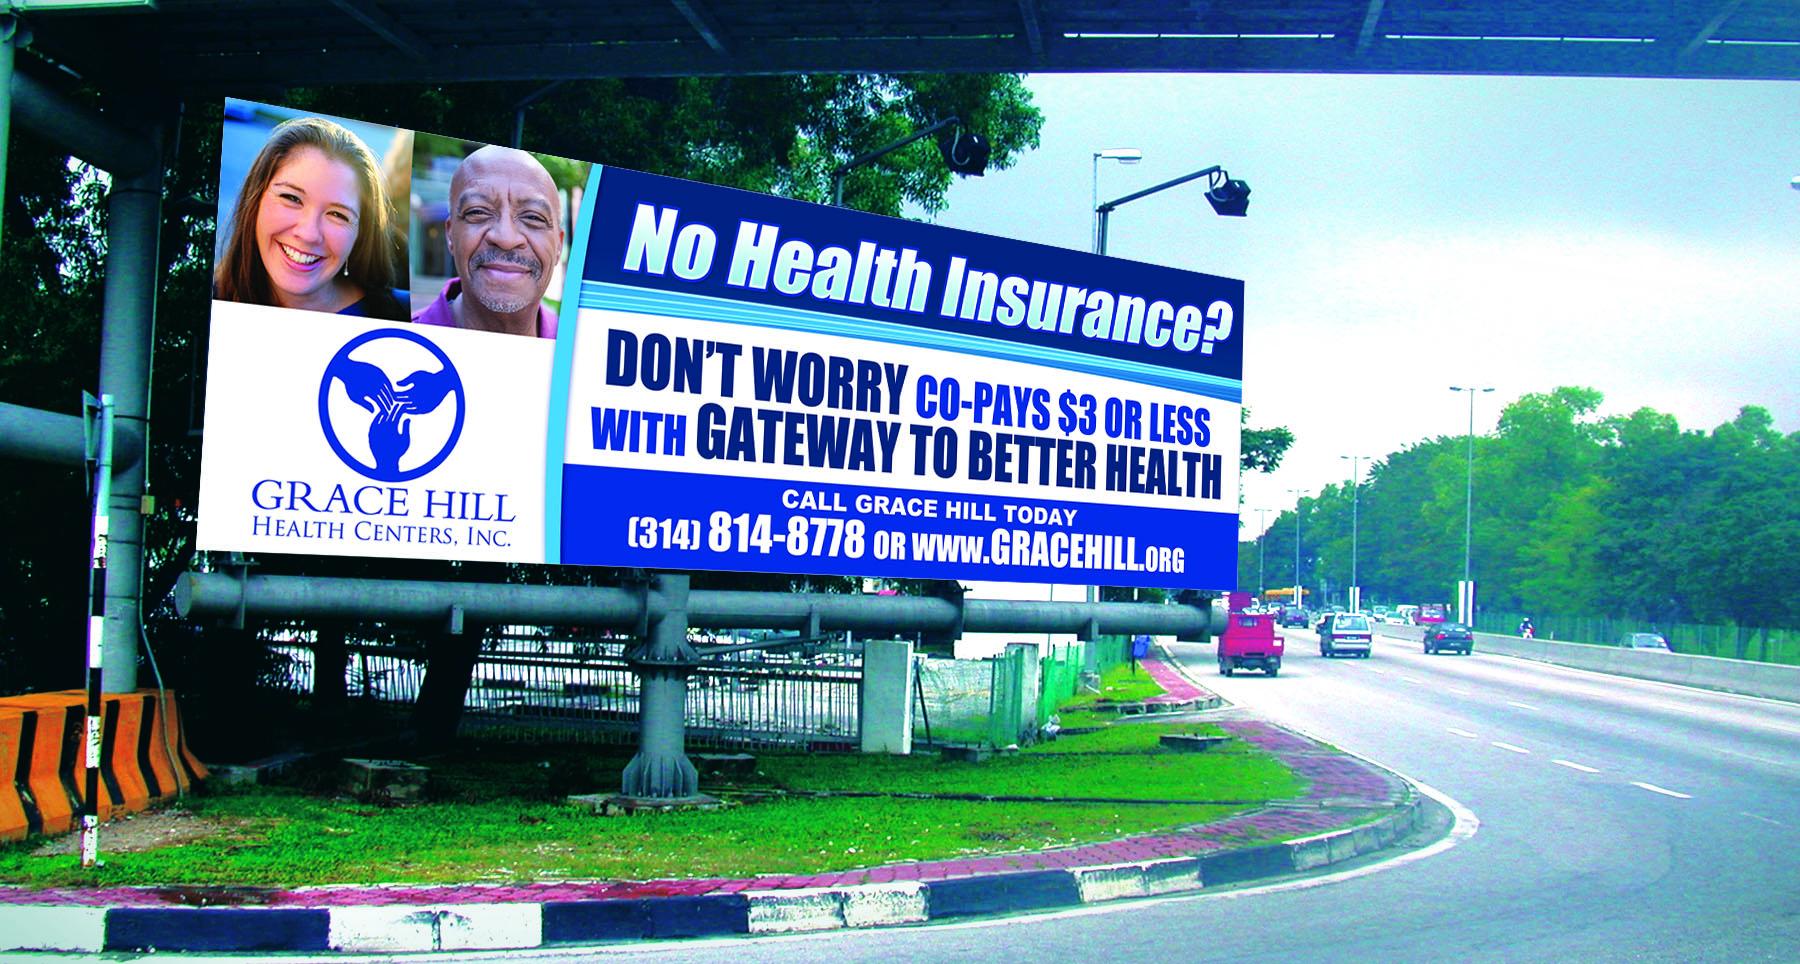 Grace Hill Health Centers